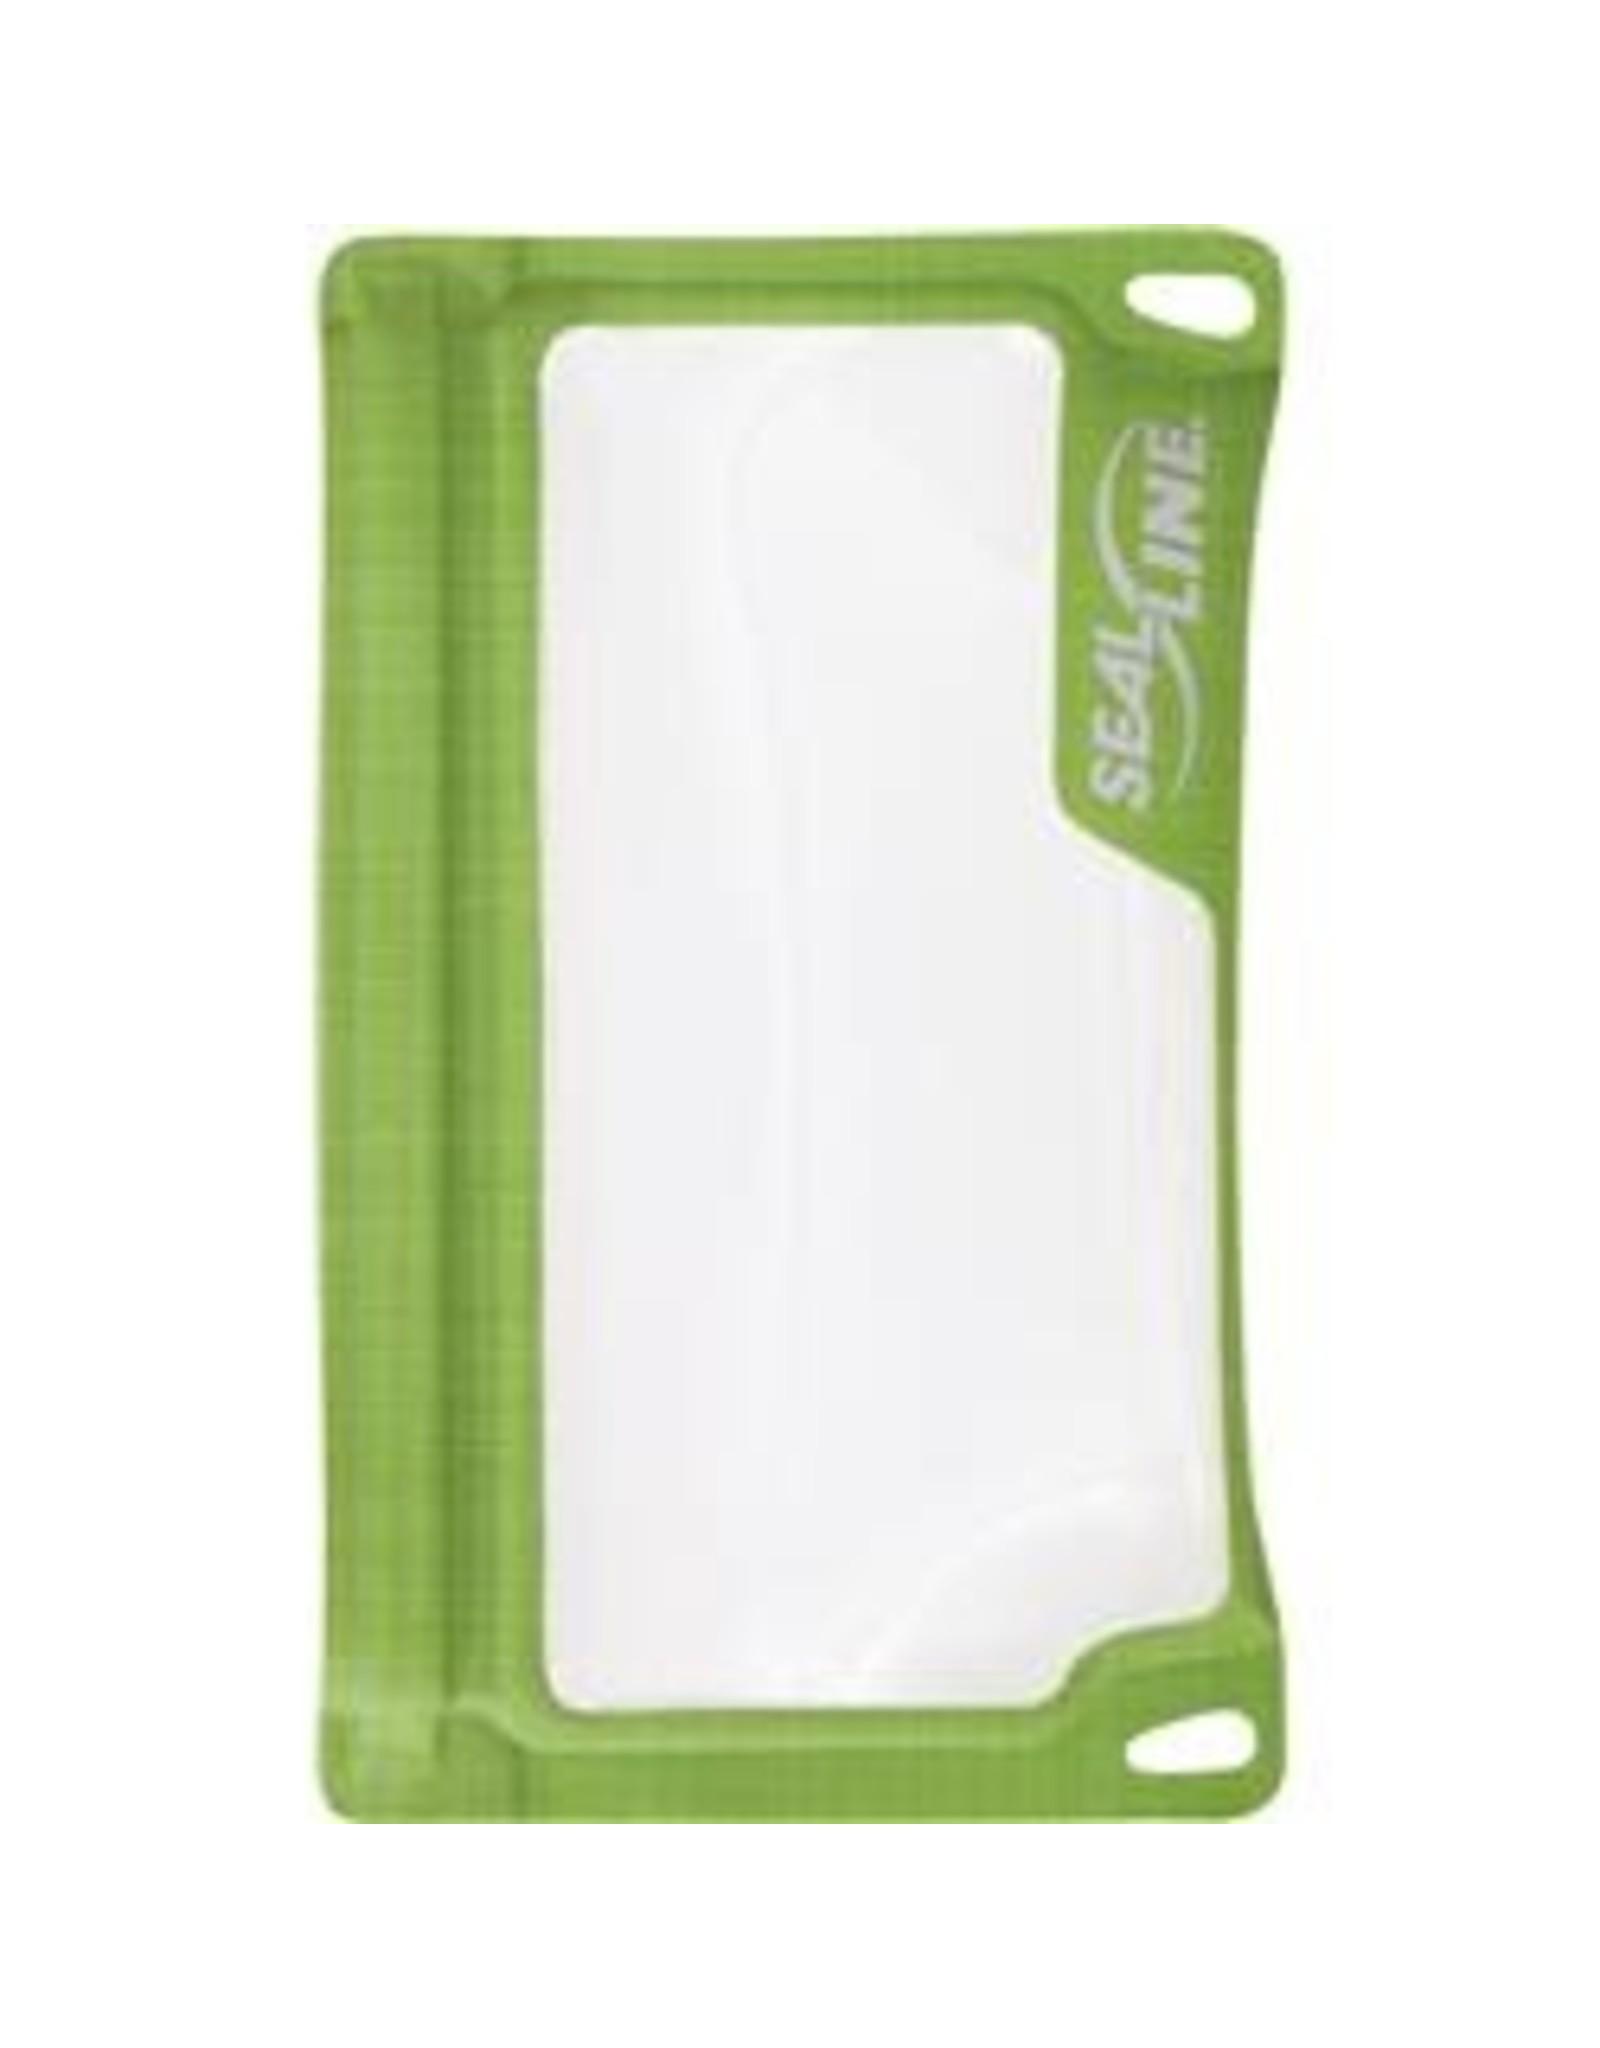 SealLine SealLine E-Case Heather Green Medium